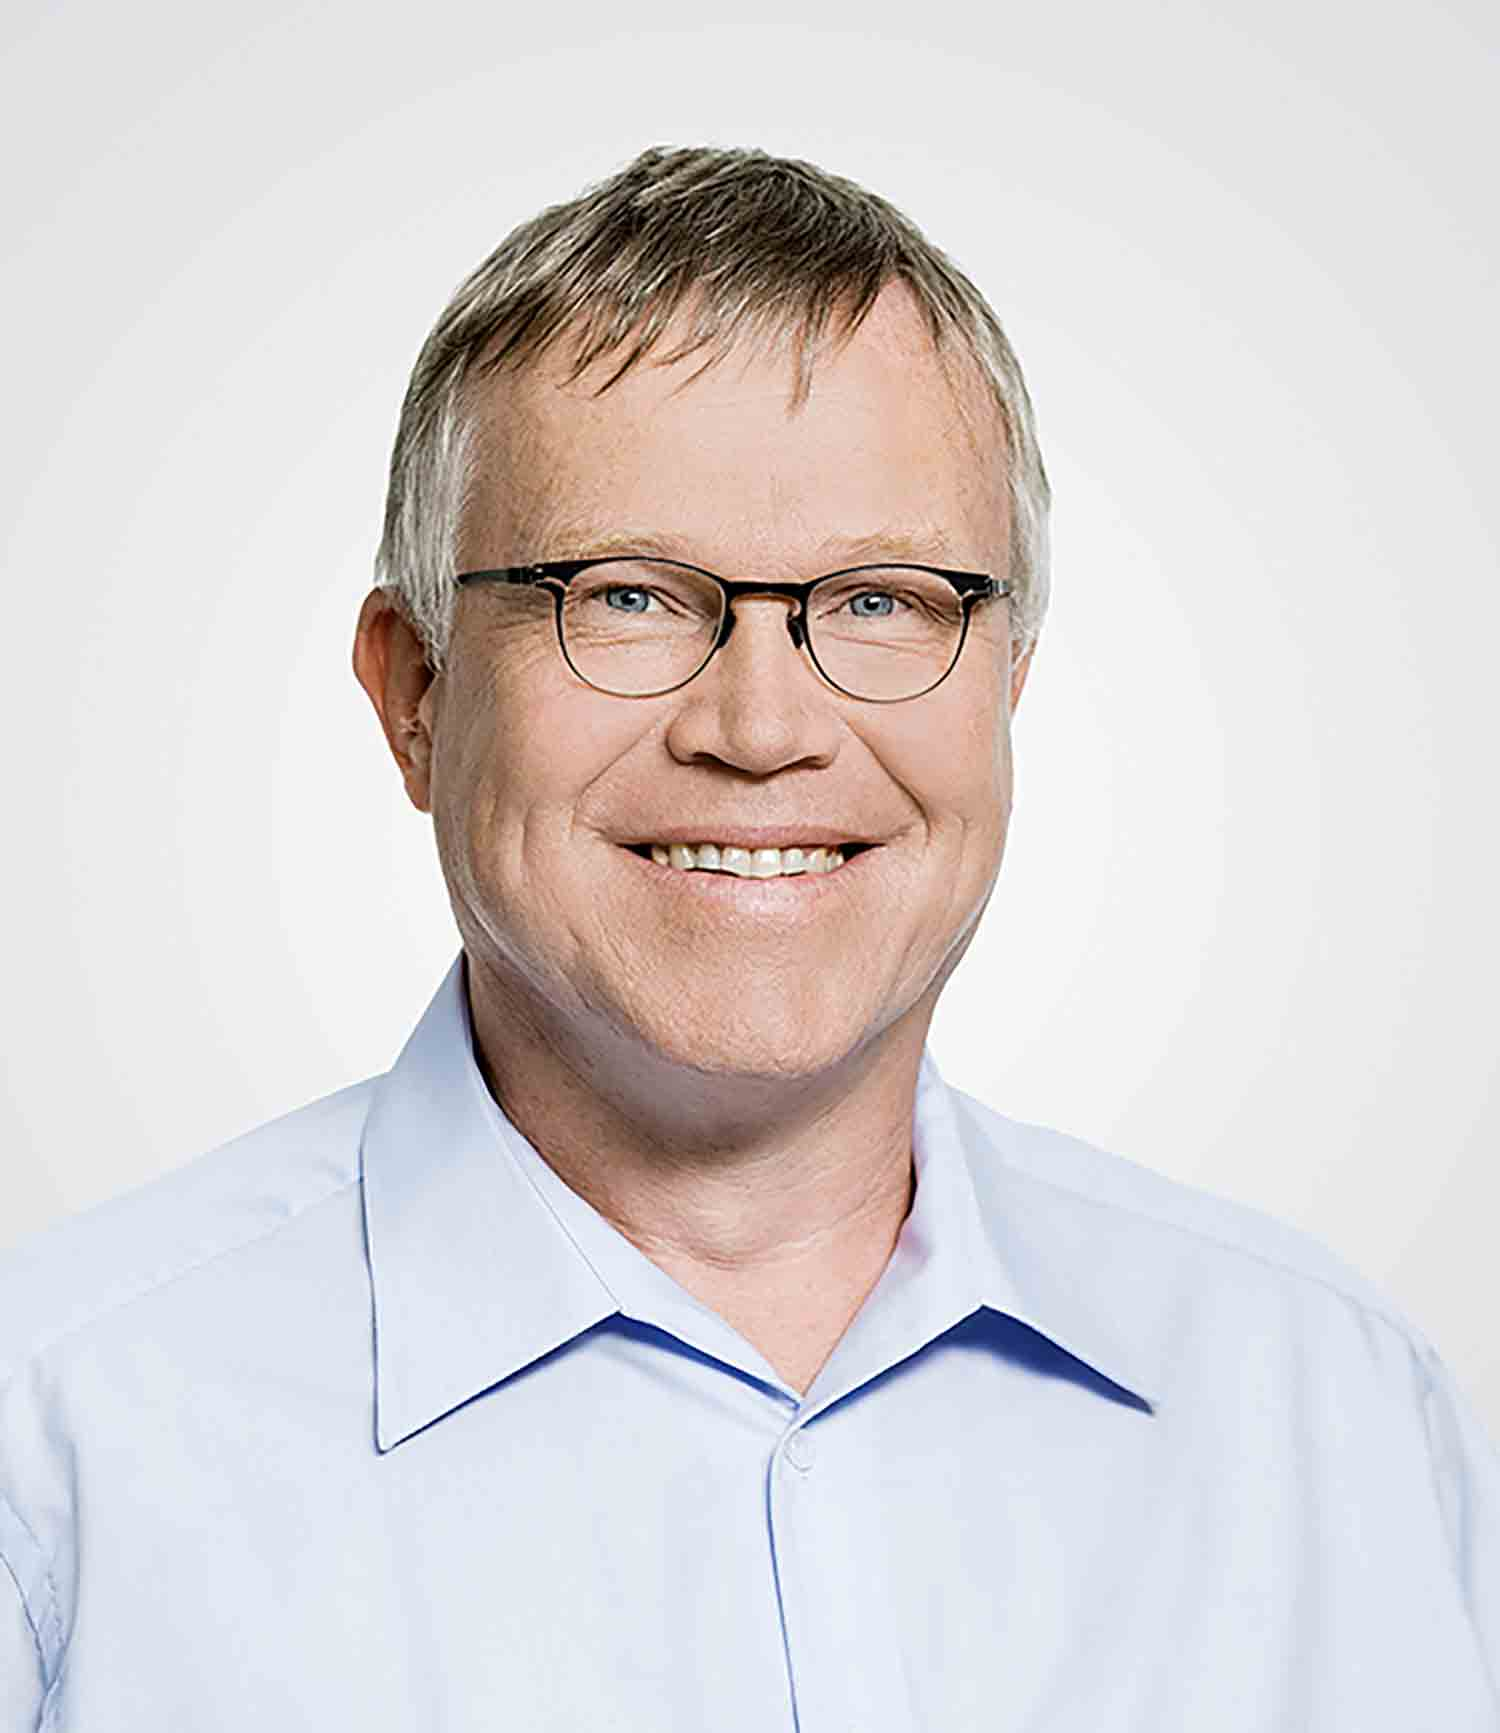 Bernd Engeler